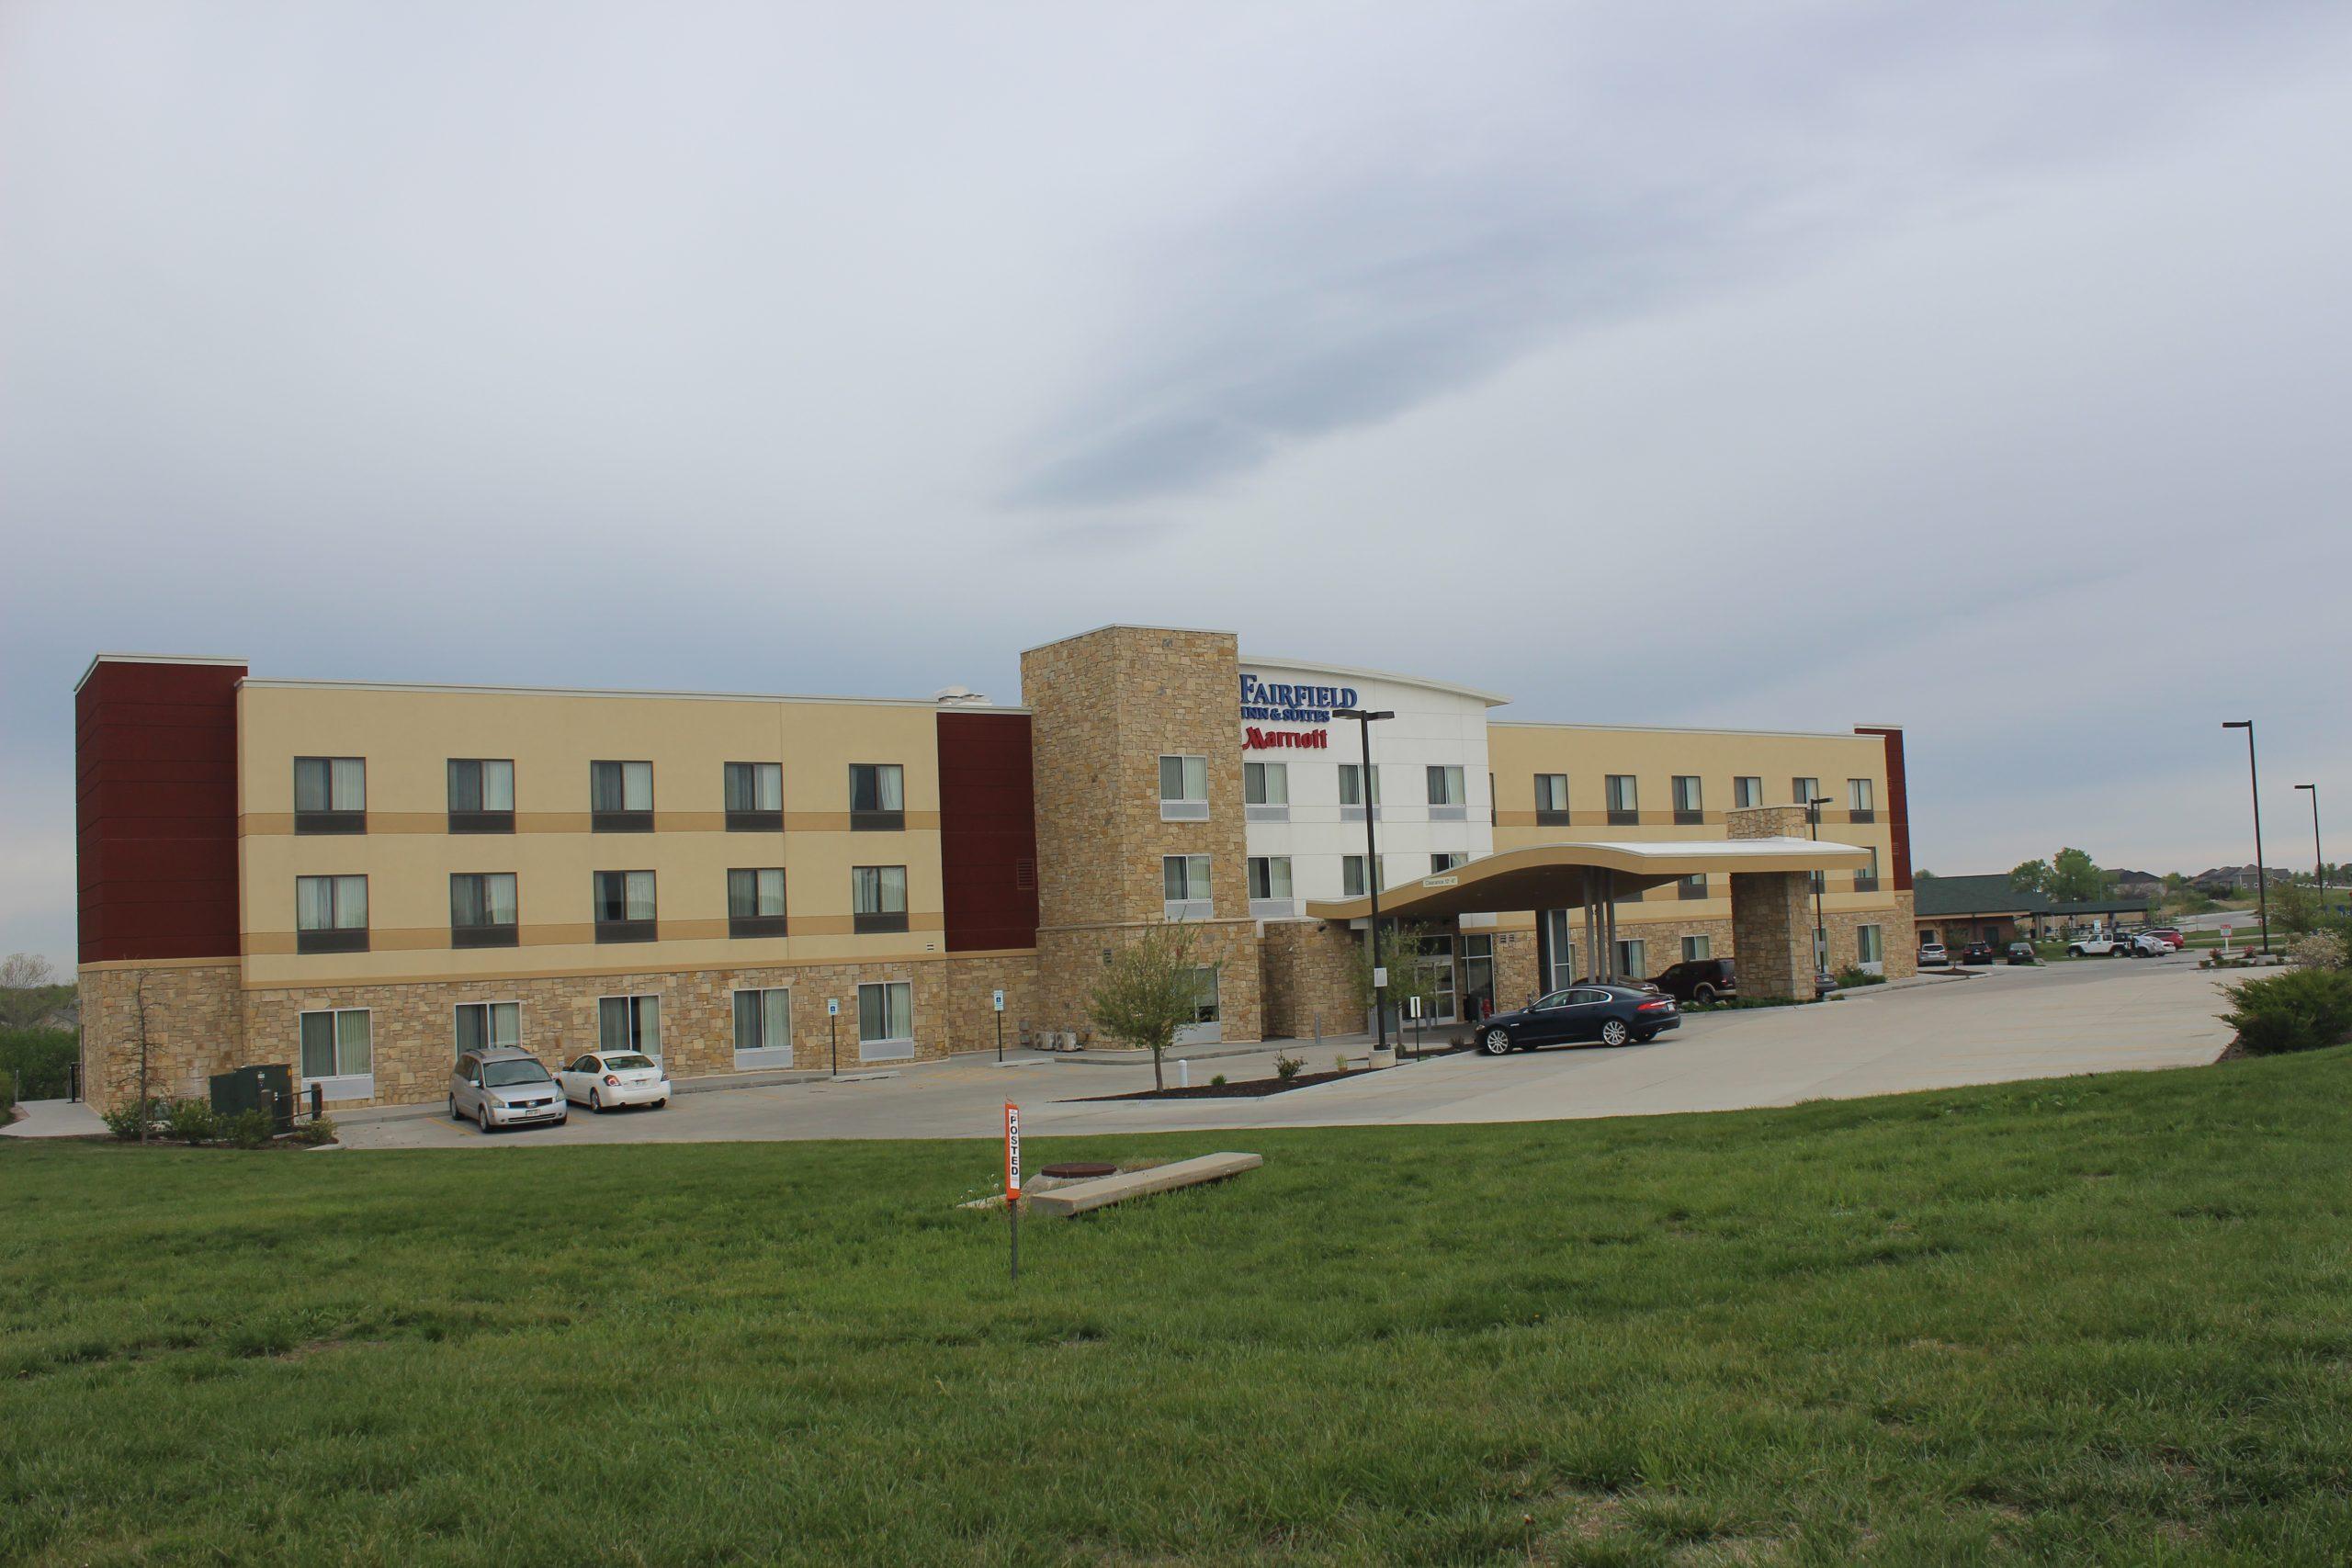 Fairfield Inn & Suites by Marriott Lincoln Southeast, Lincoln, NE